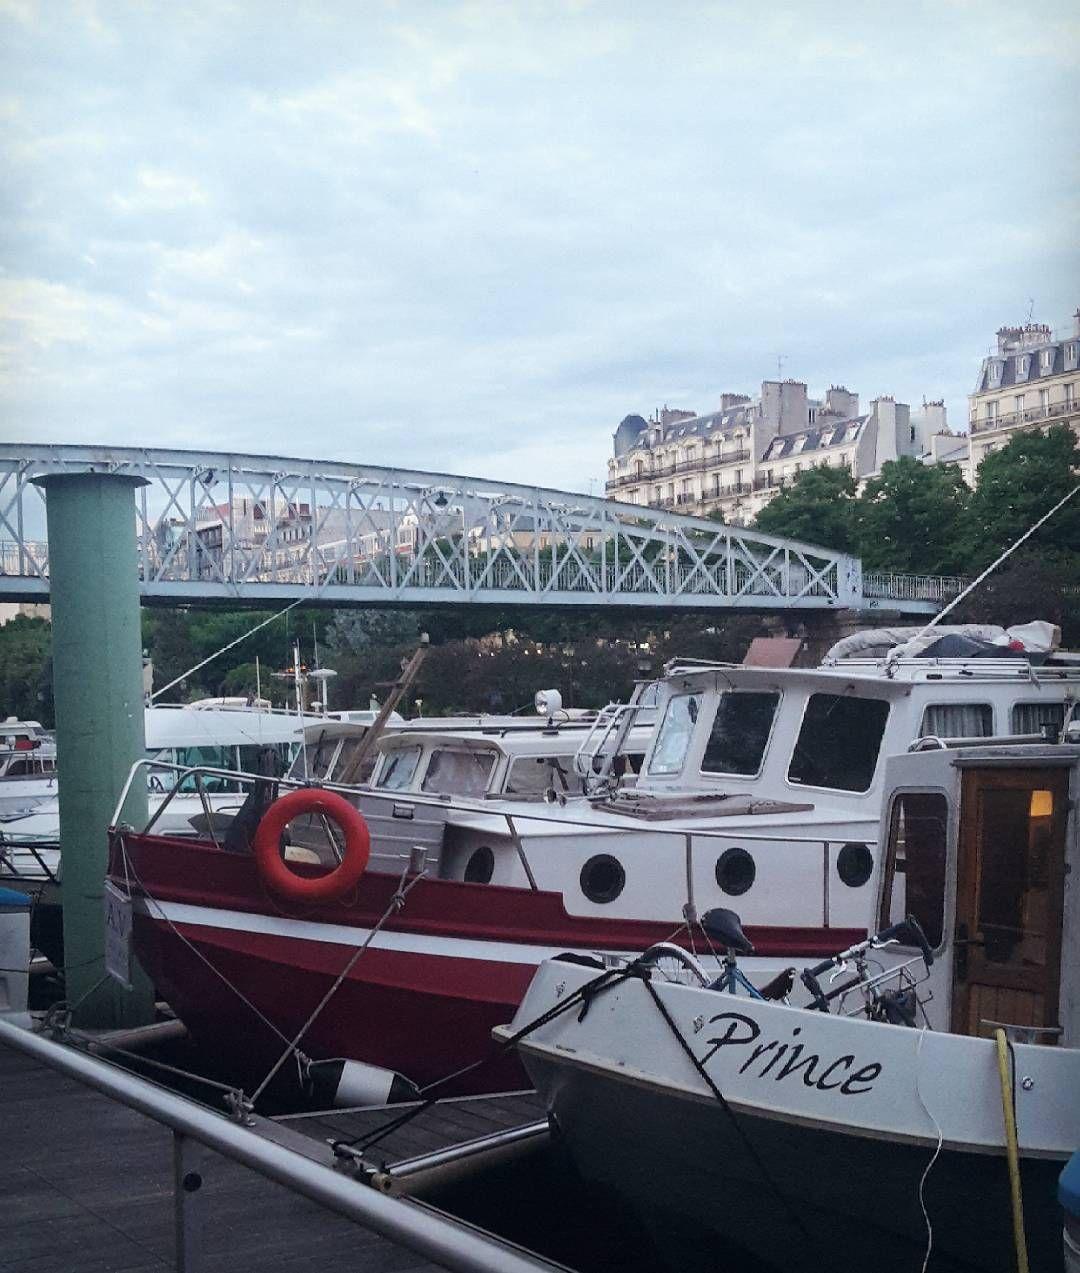 Paris is magic ⛵ �� �� #paris #travel #magic #bastille #happymoment #friends #voyage http://tipsrazzi.com/ipost/1515604802133635499/?code=BUIgombDTGr